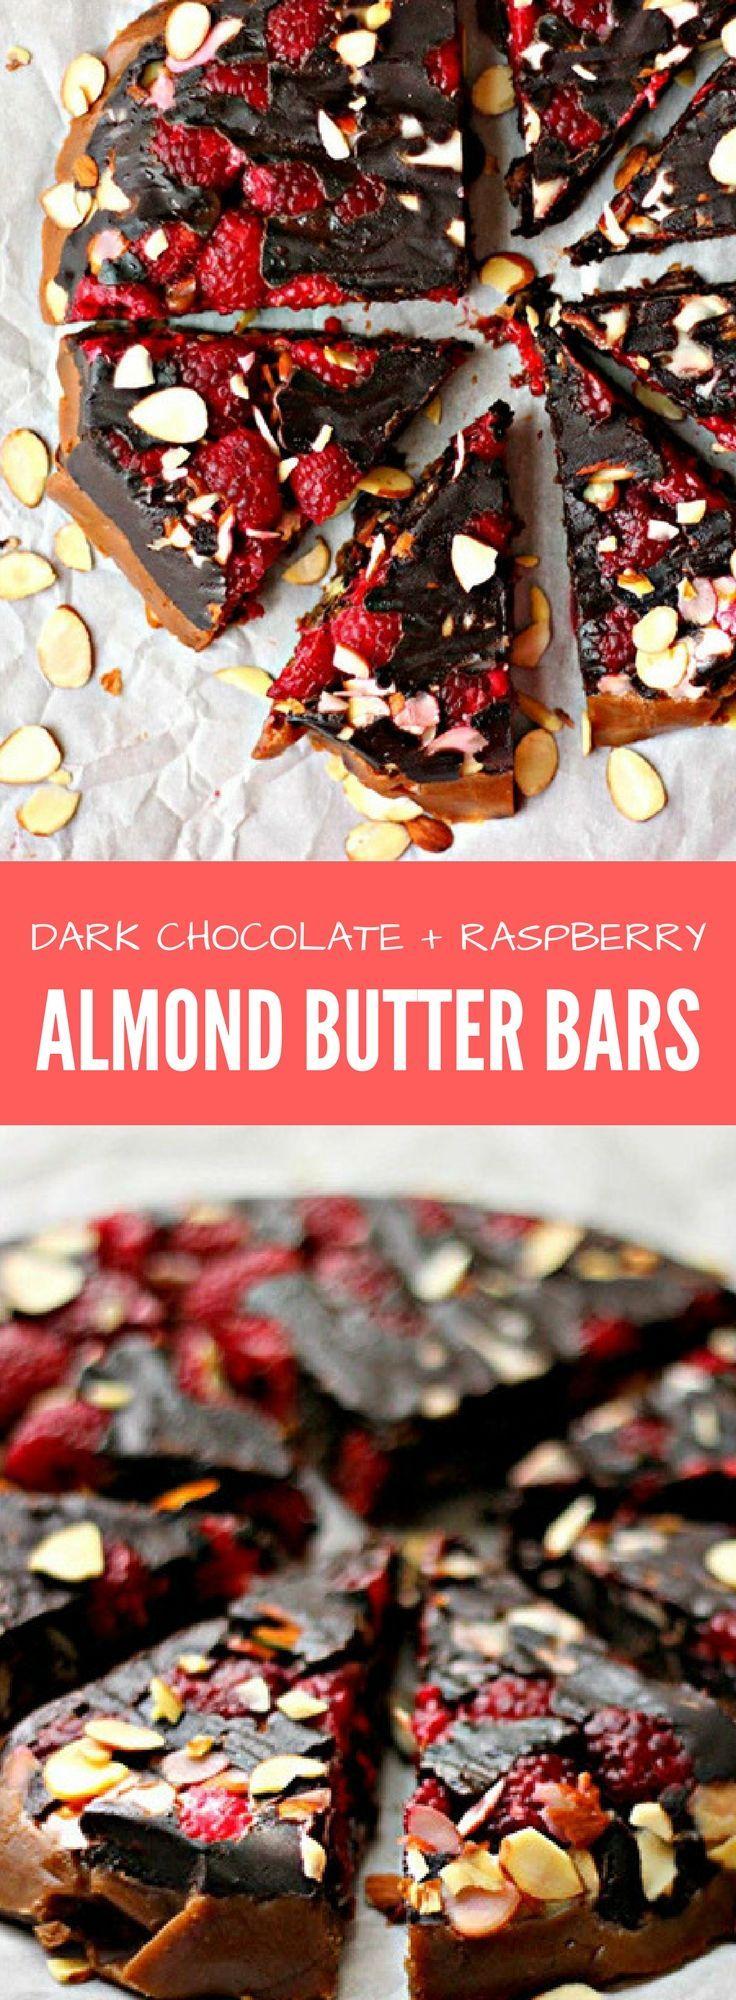 Dark chocolate raspberry almond butter bars recipe